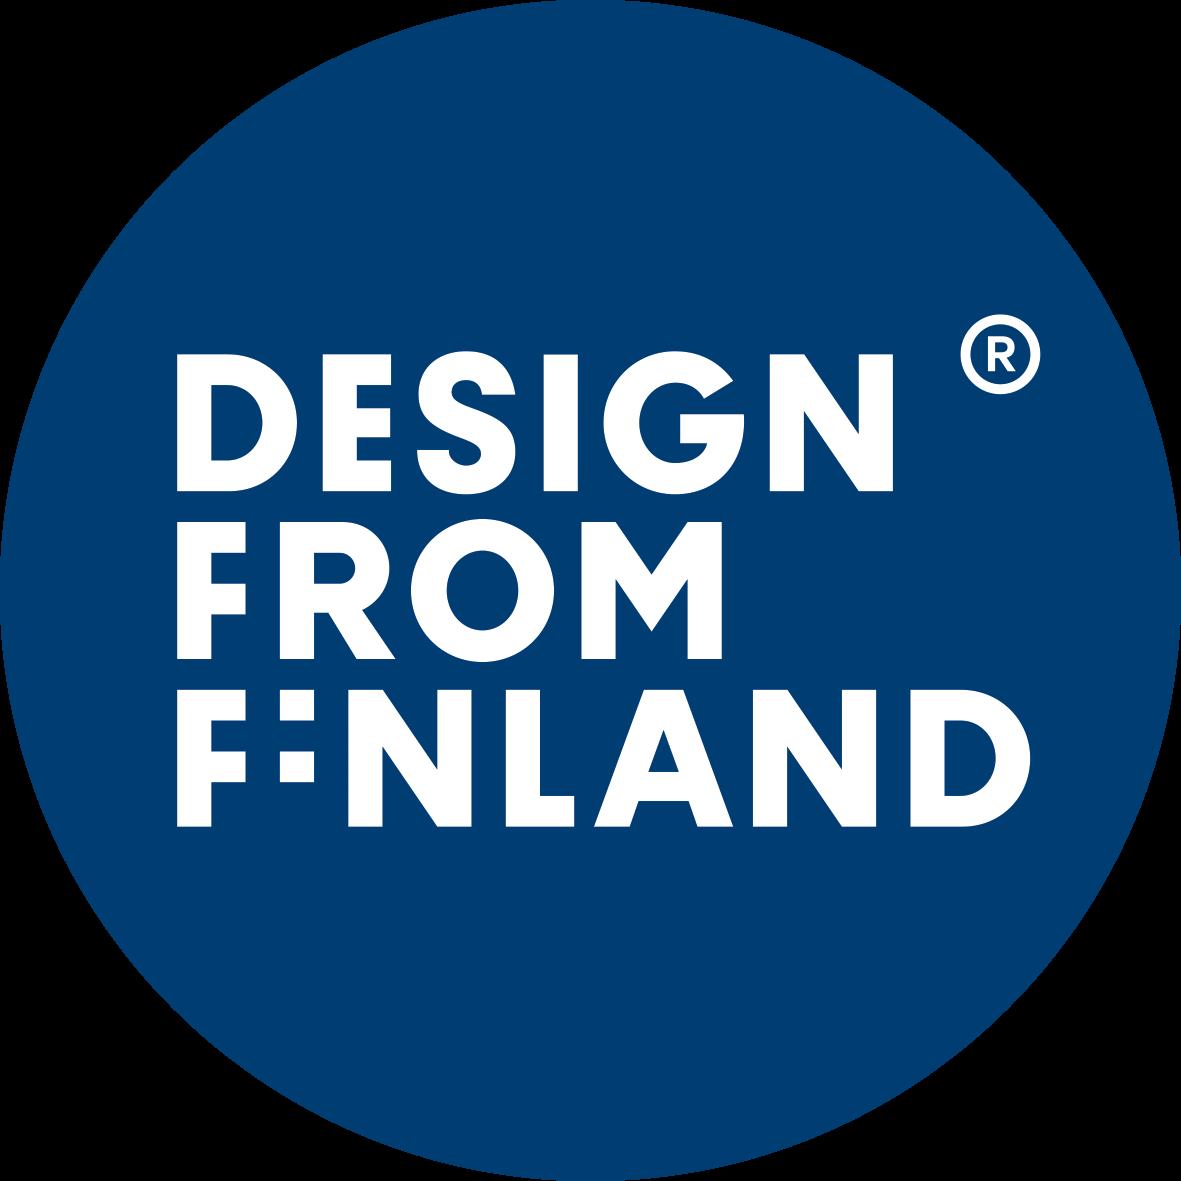 Design from Finland logo